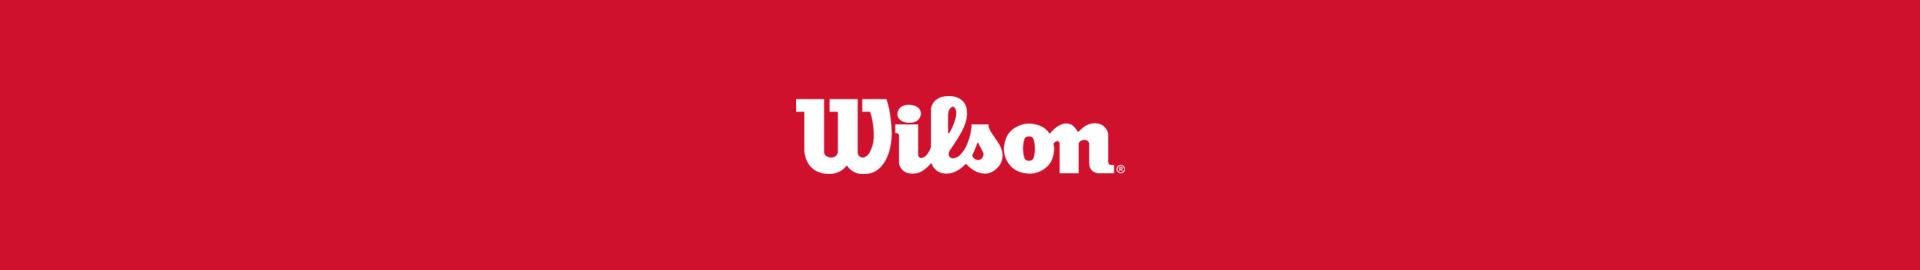 banner wilson